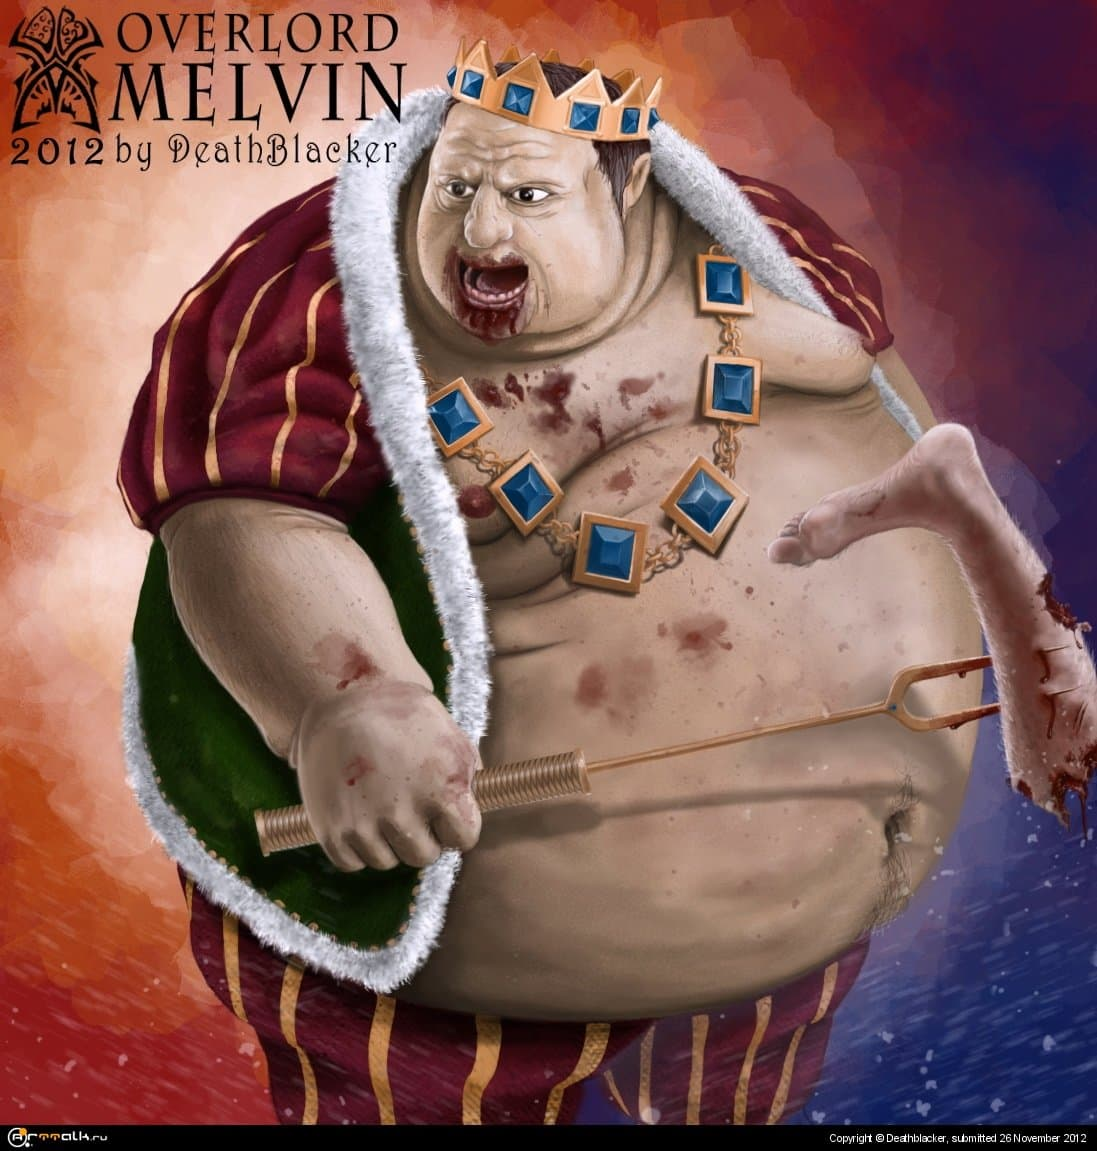 Melvin Fanart Overlord